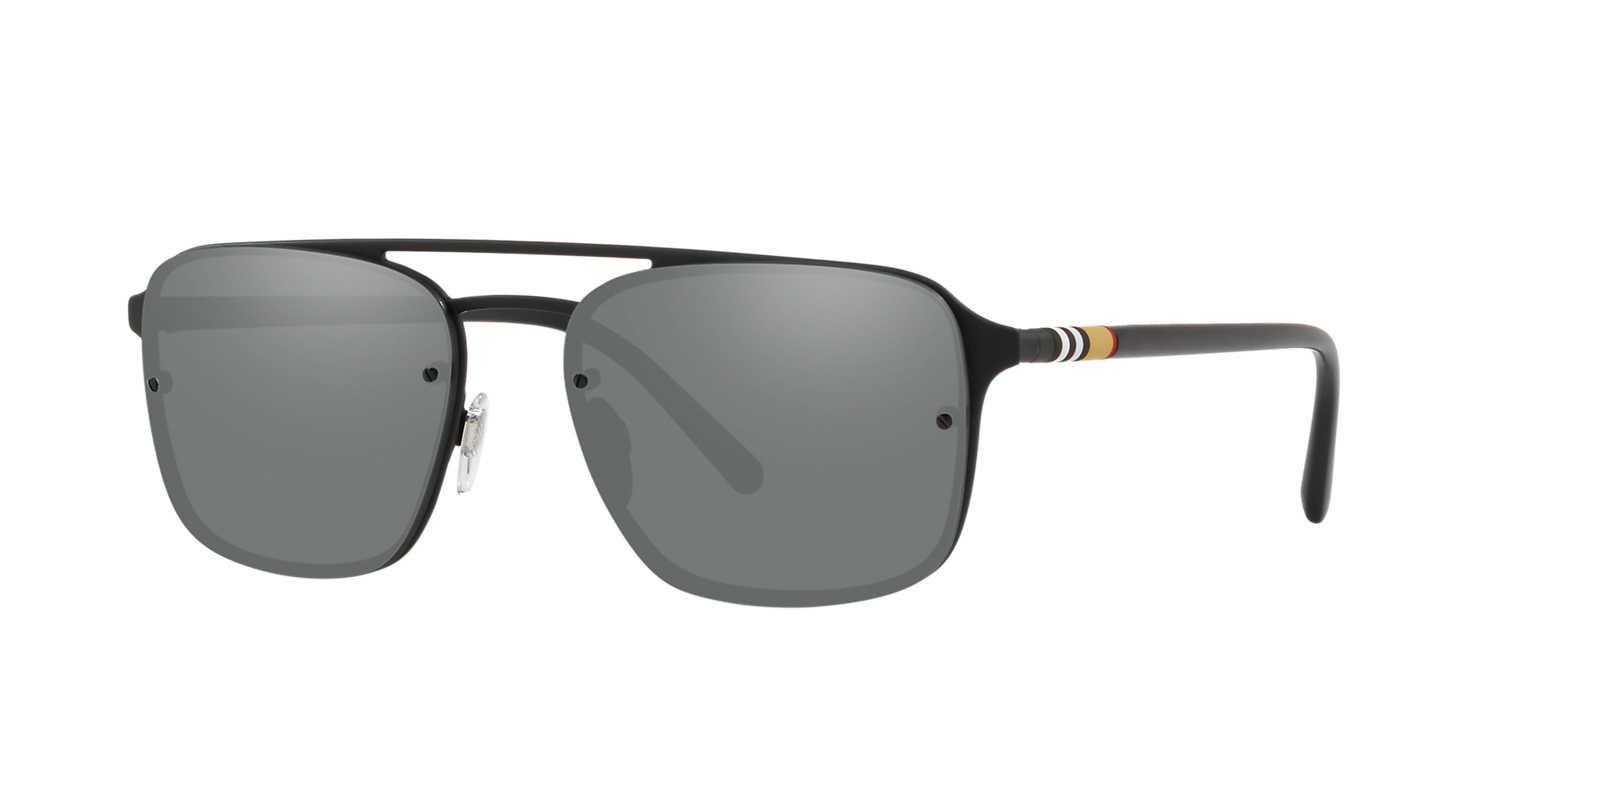 93e927c89f5 Burberry Sunglass Be3095 56 in Metallic for Men - Lyst